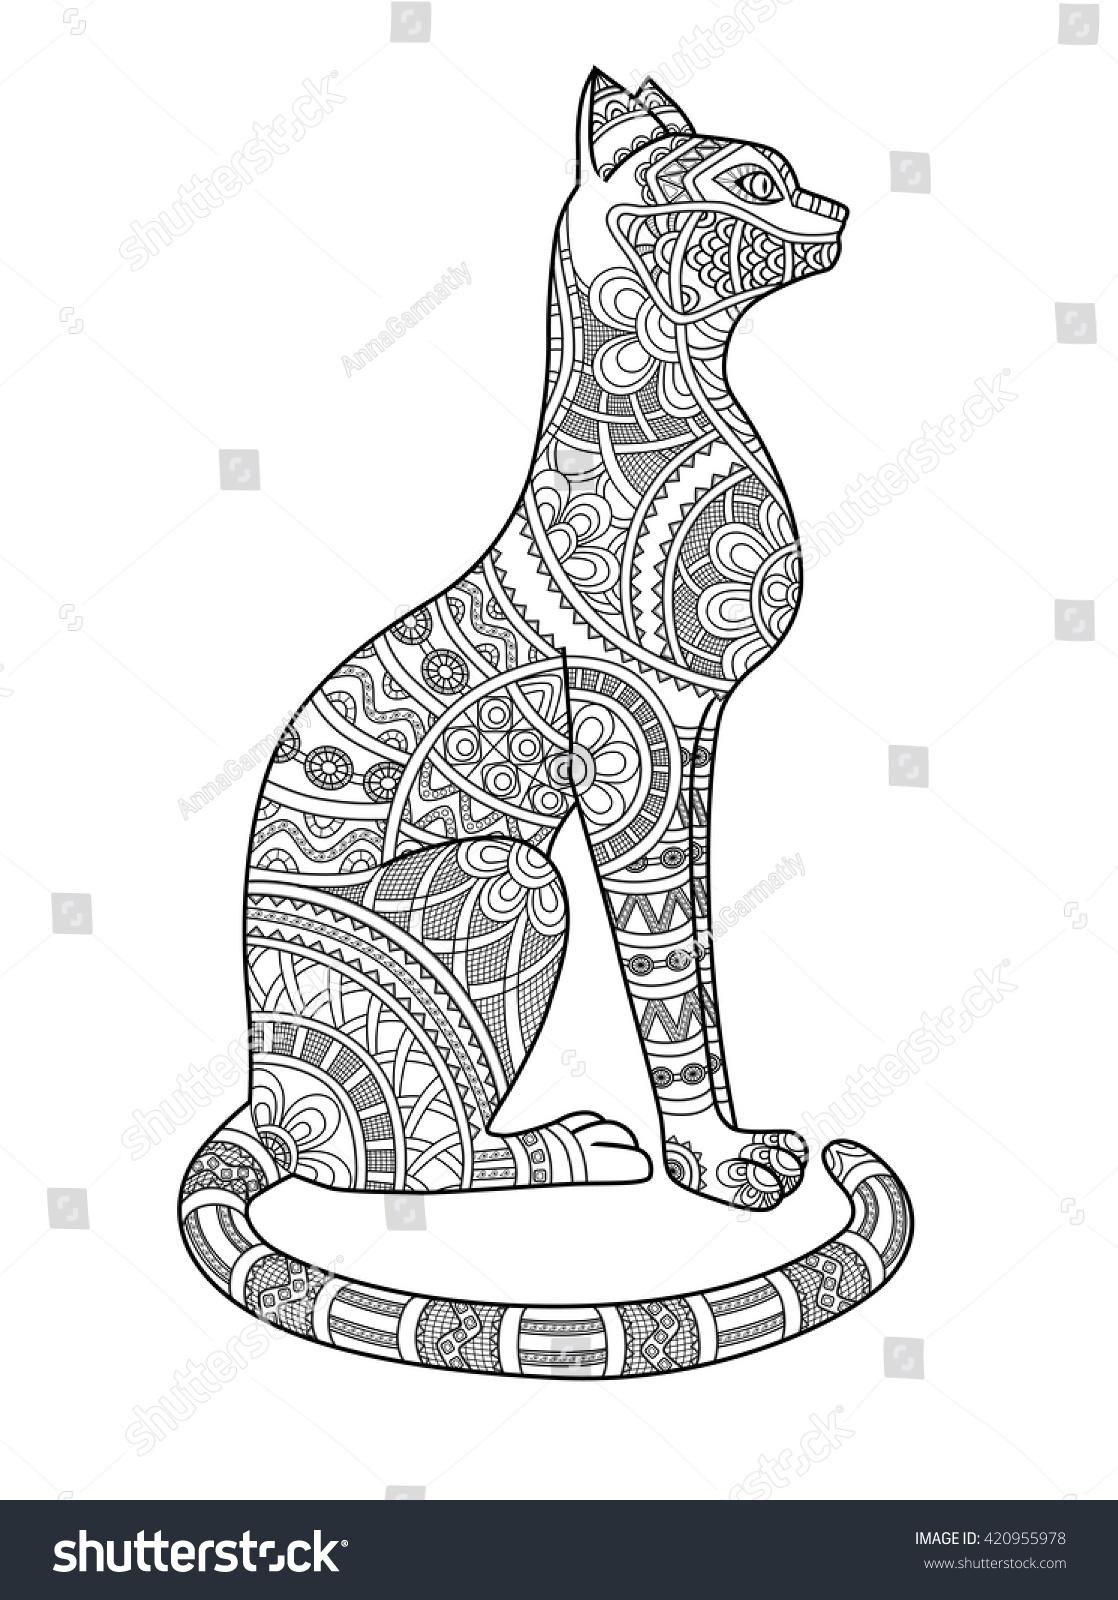 Decorative Outline Cat Ornate Silhouette Template Stock Vector